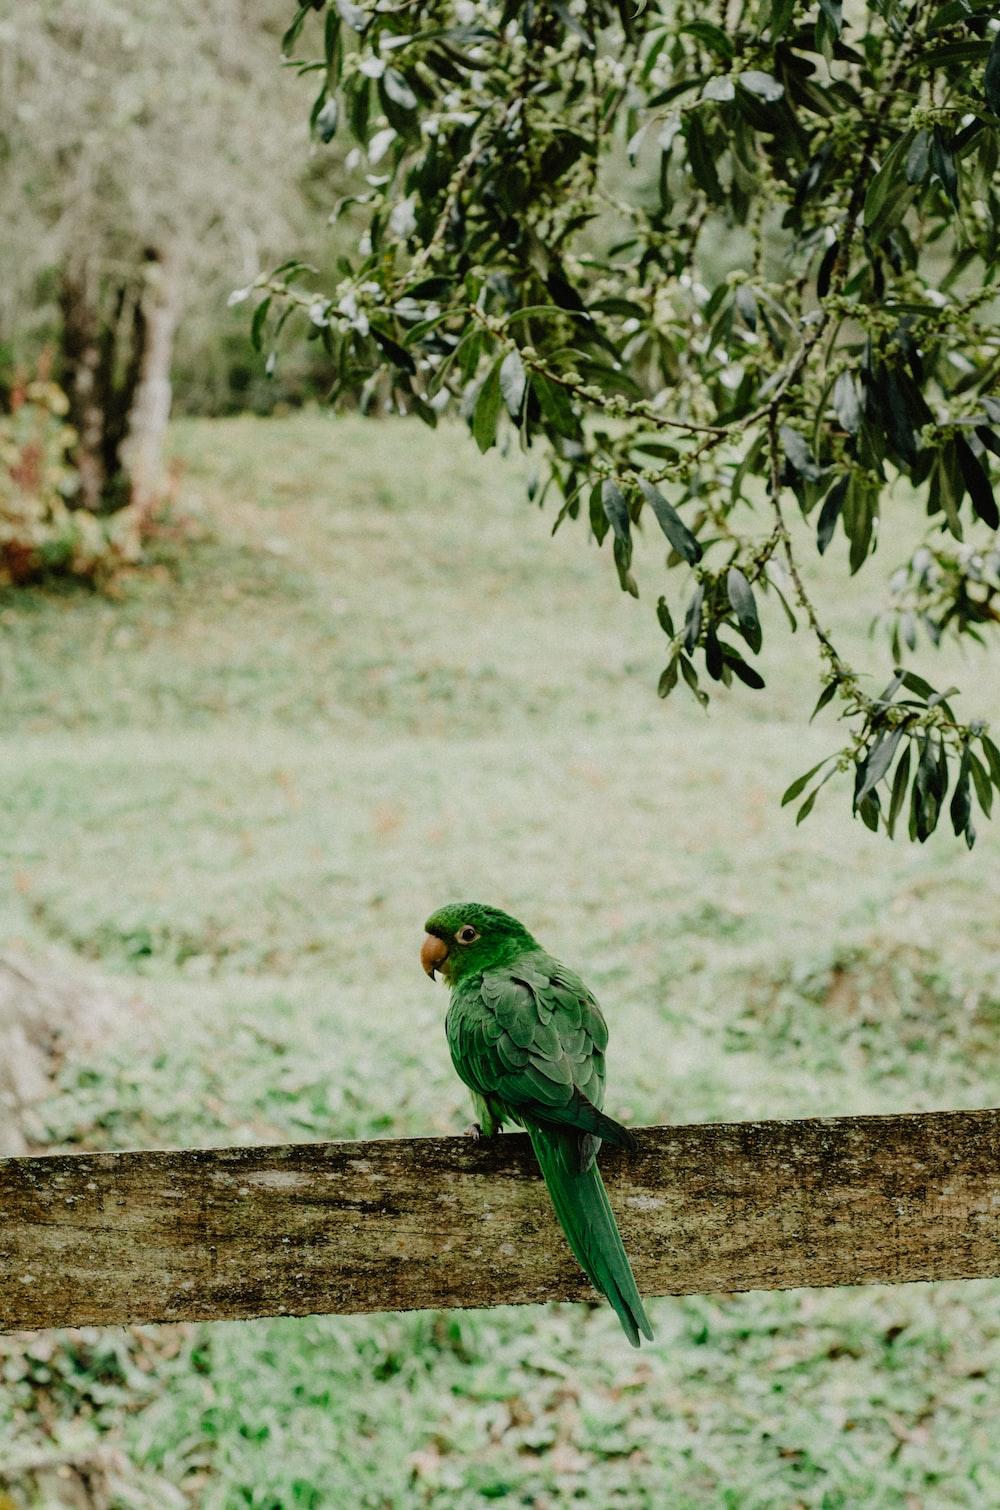 perched green bird